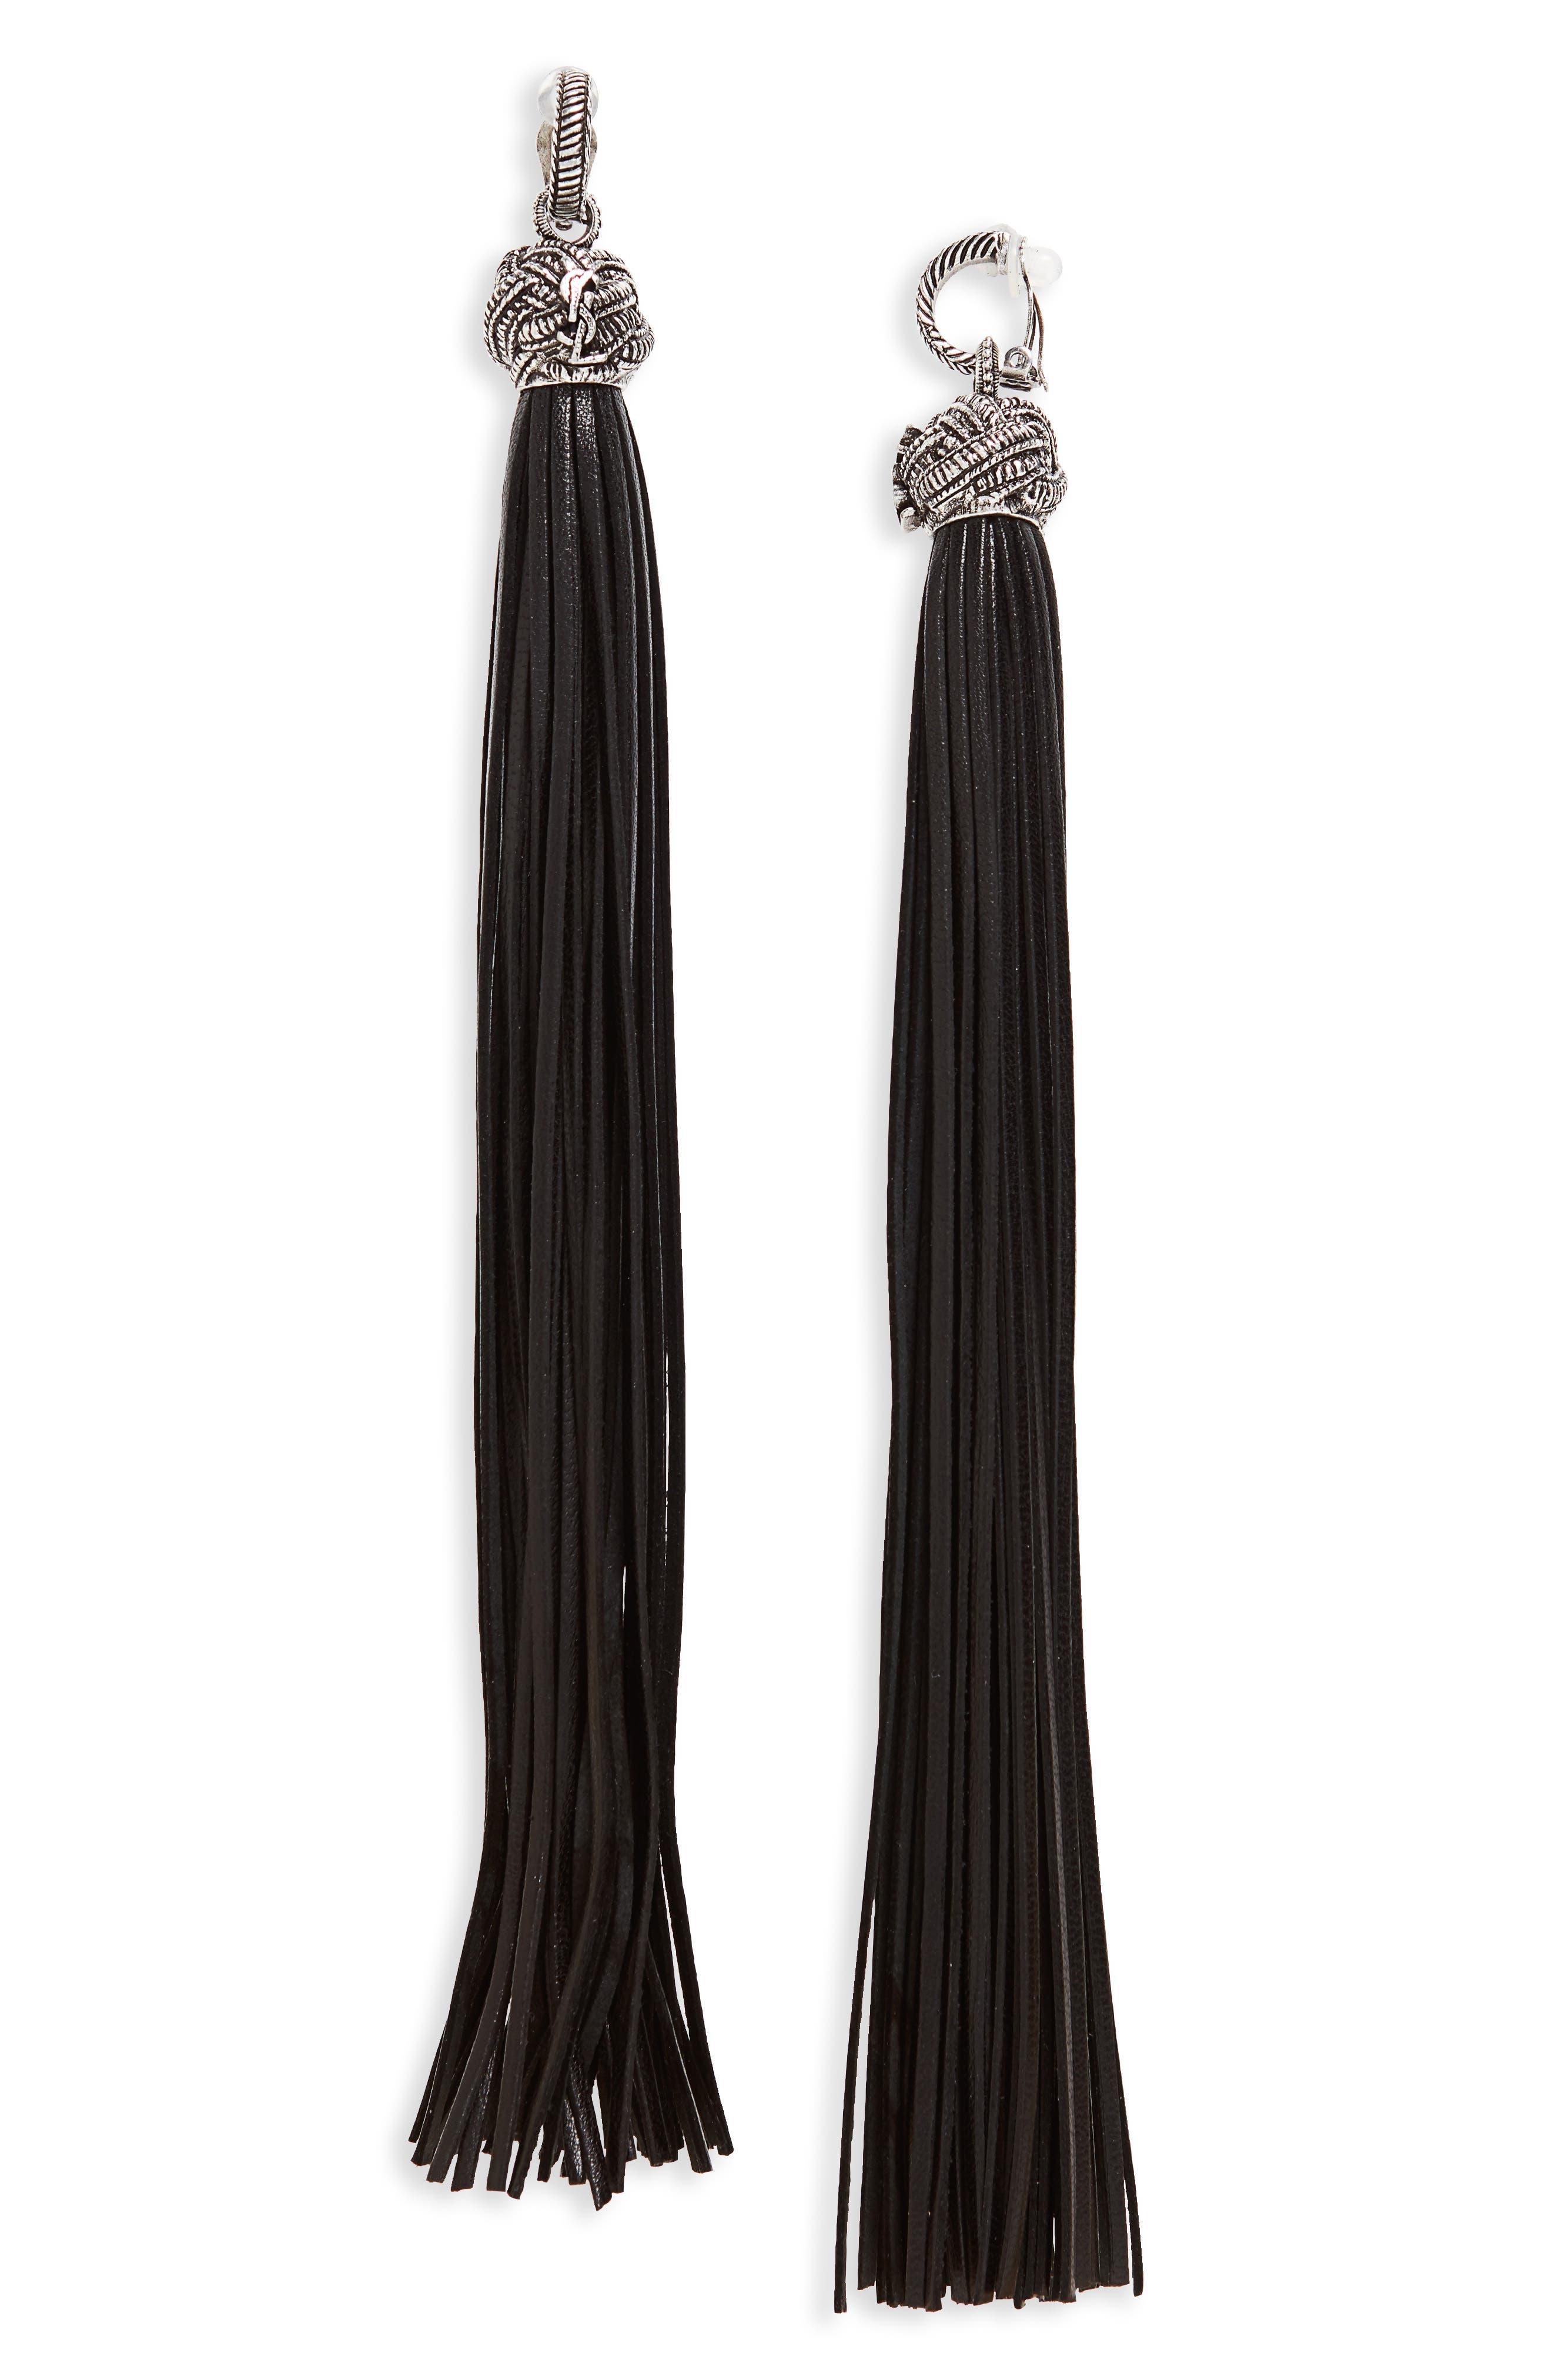 Leather Tassel Earrings,                             Main thumbnail 1, color,                             Argent Oxyde/ Noir